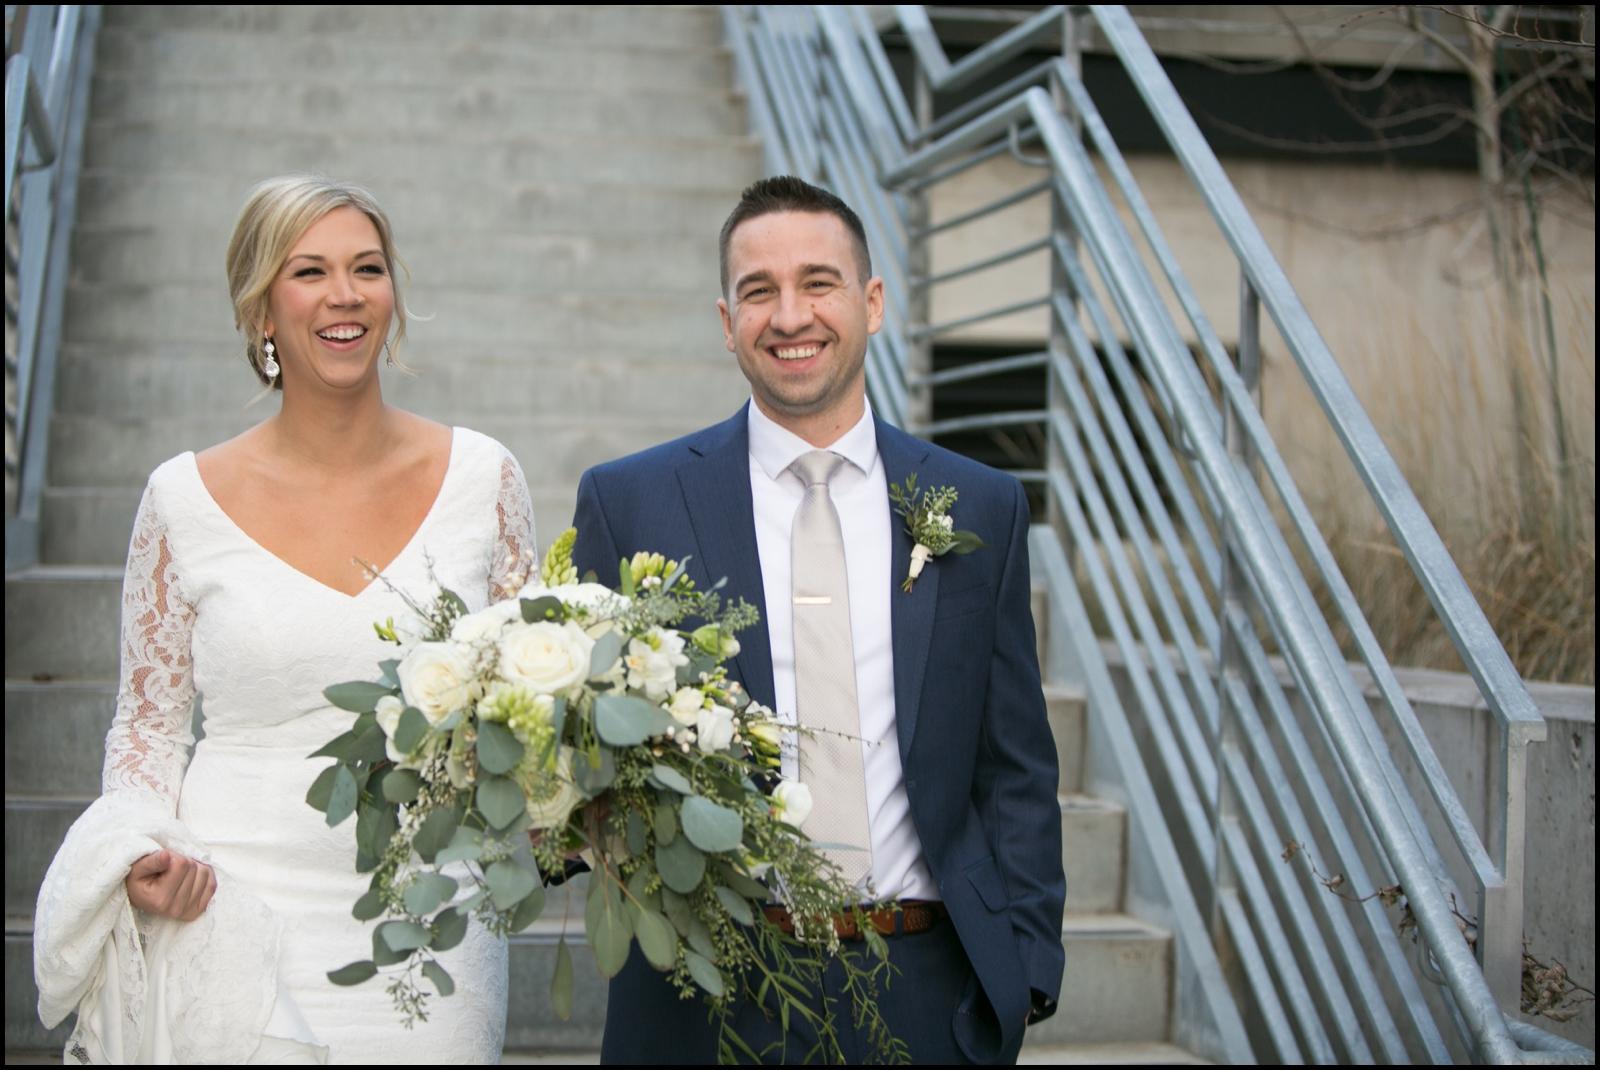 Minnesota wedding planner